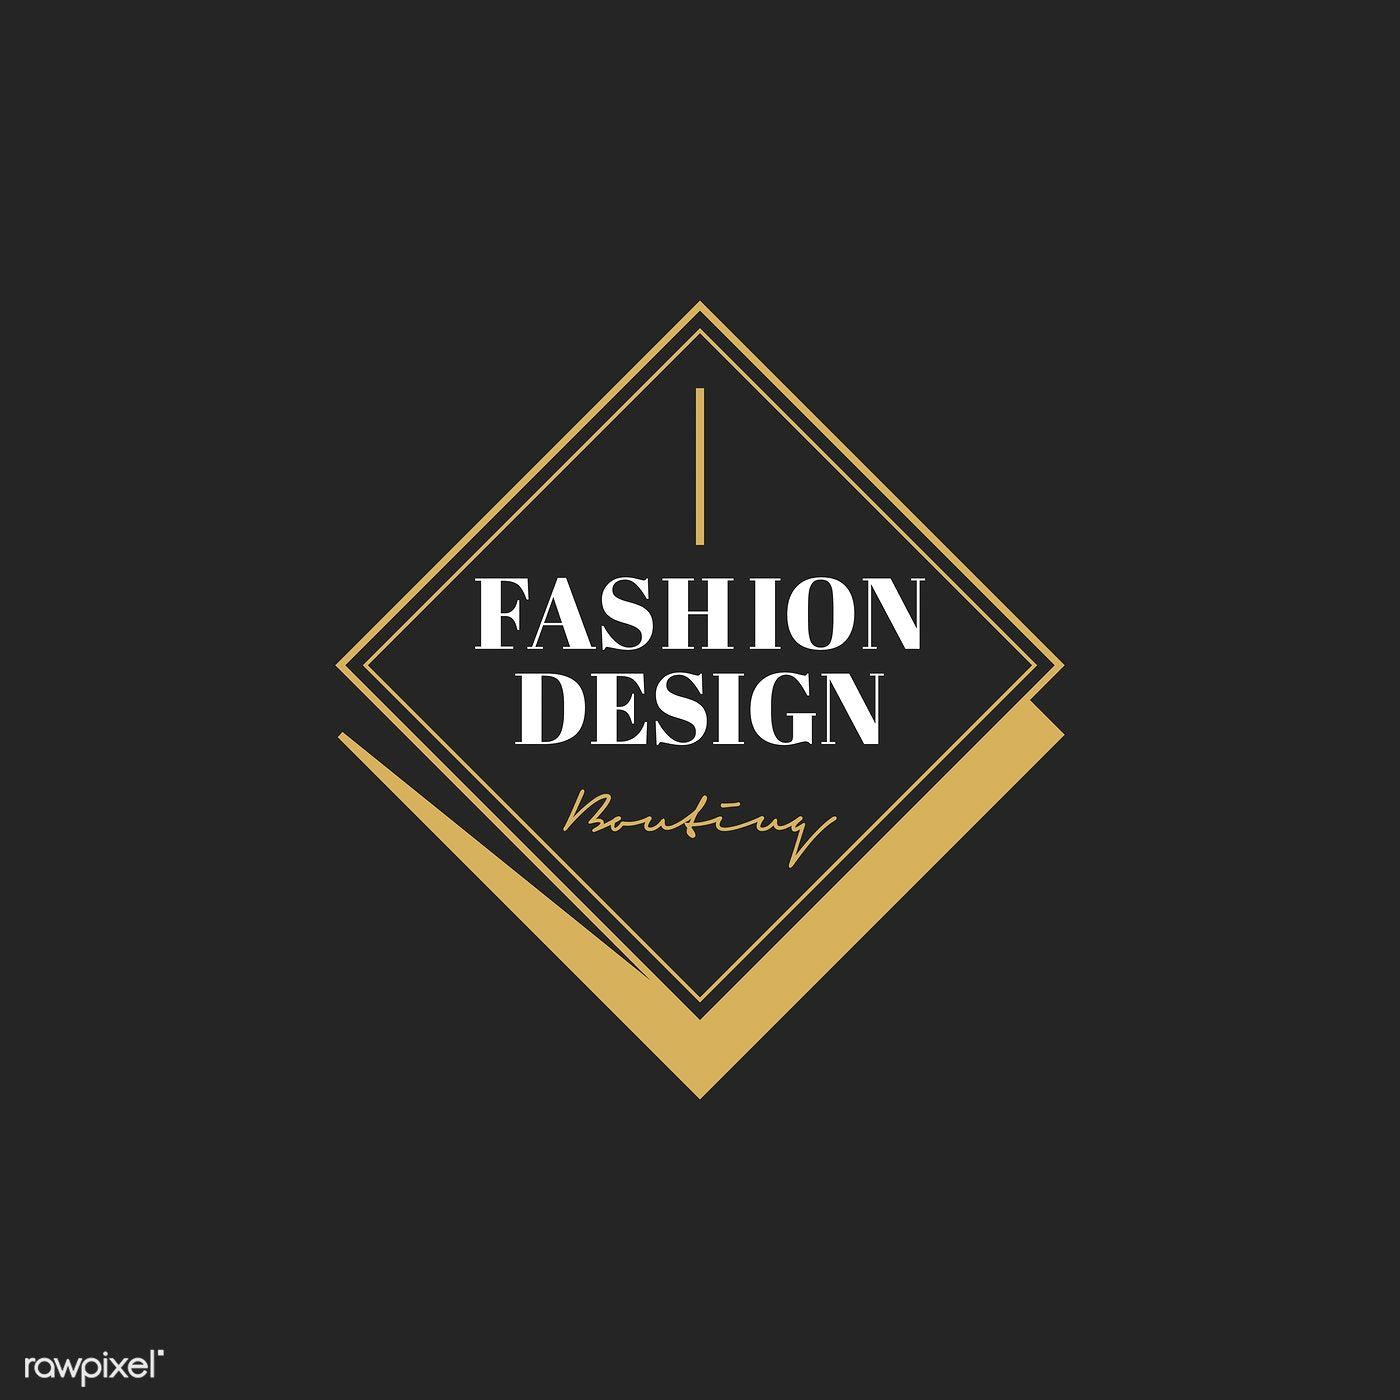 Creative Banner Design For Shop